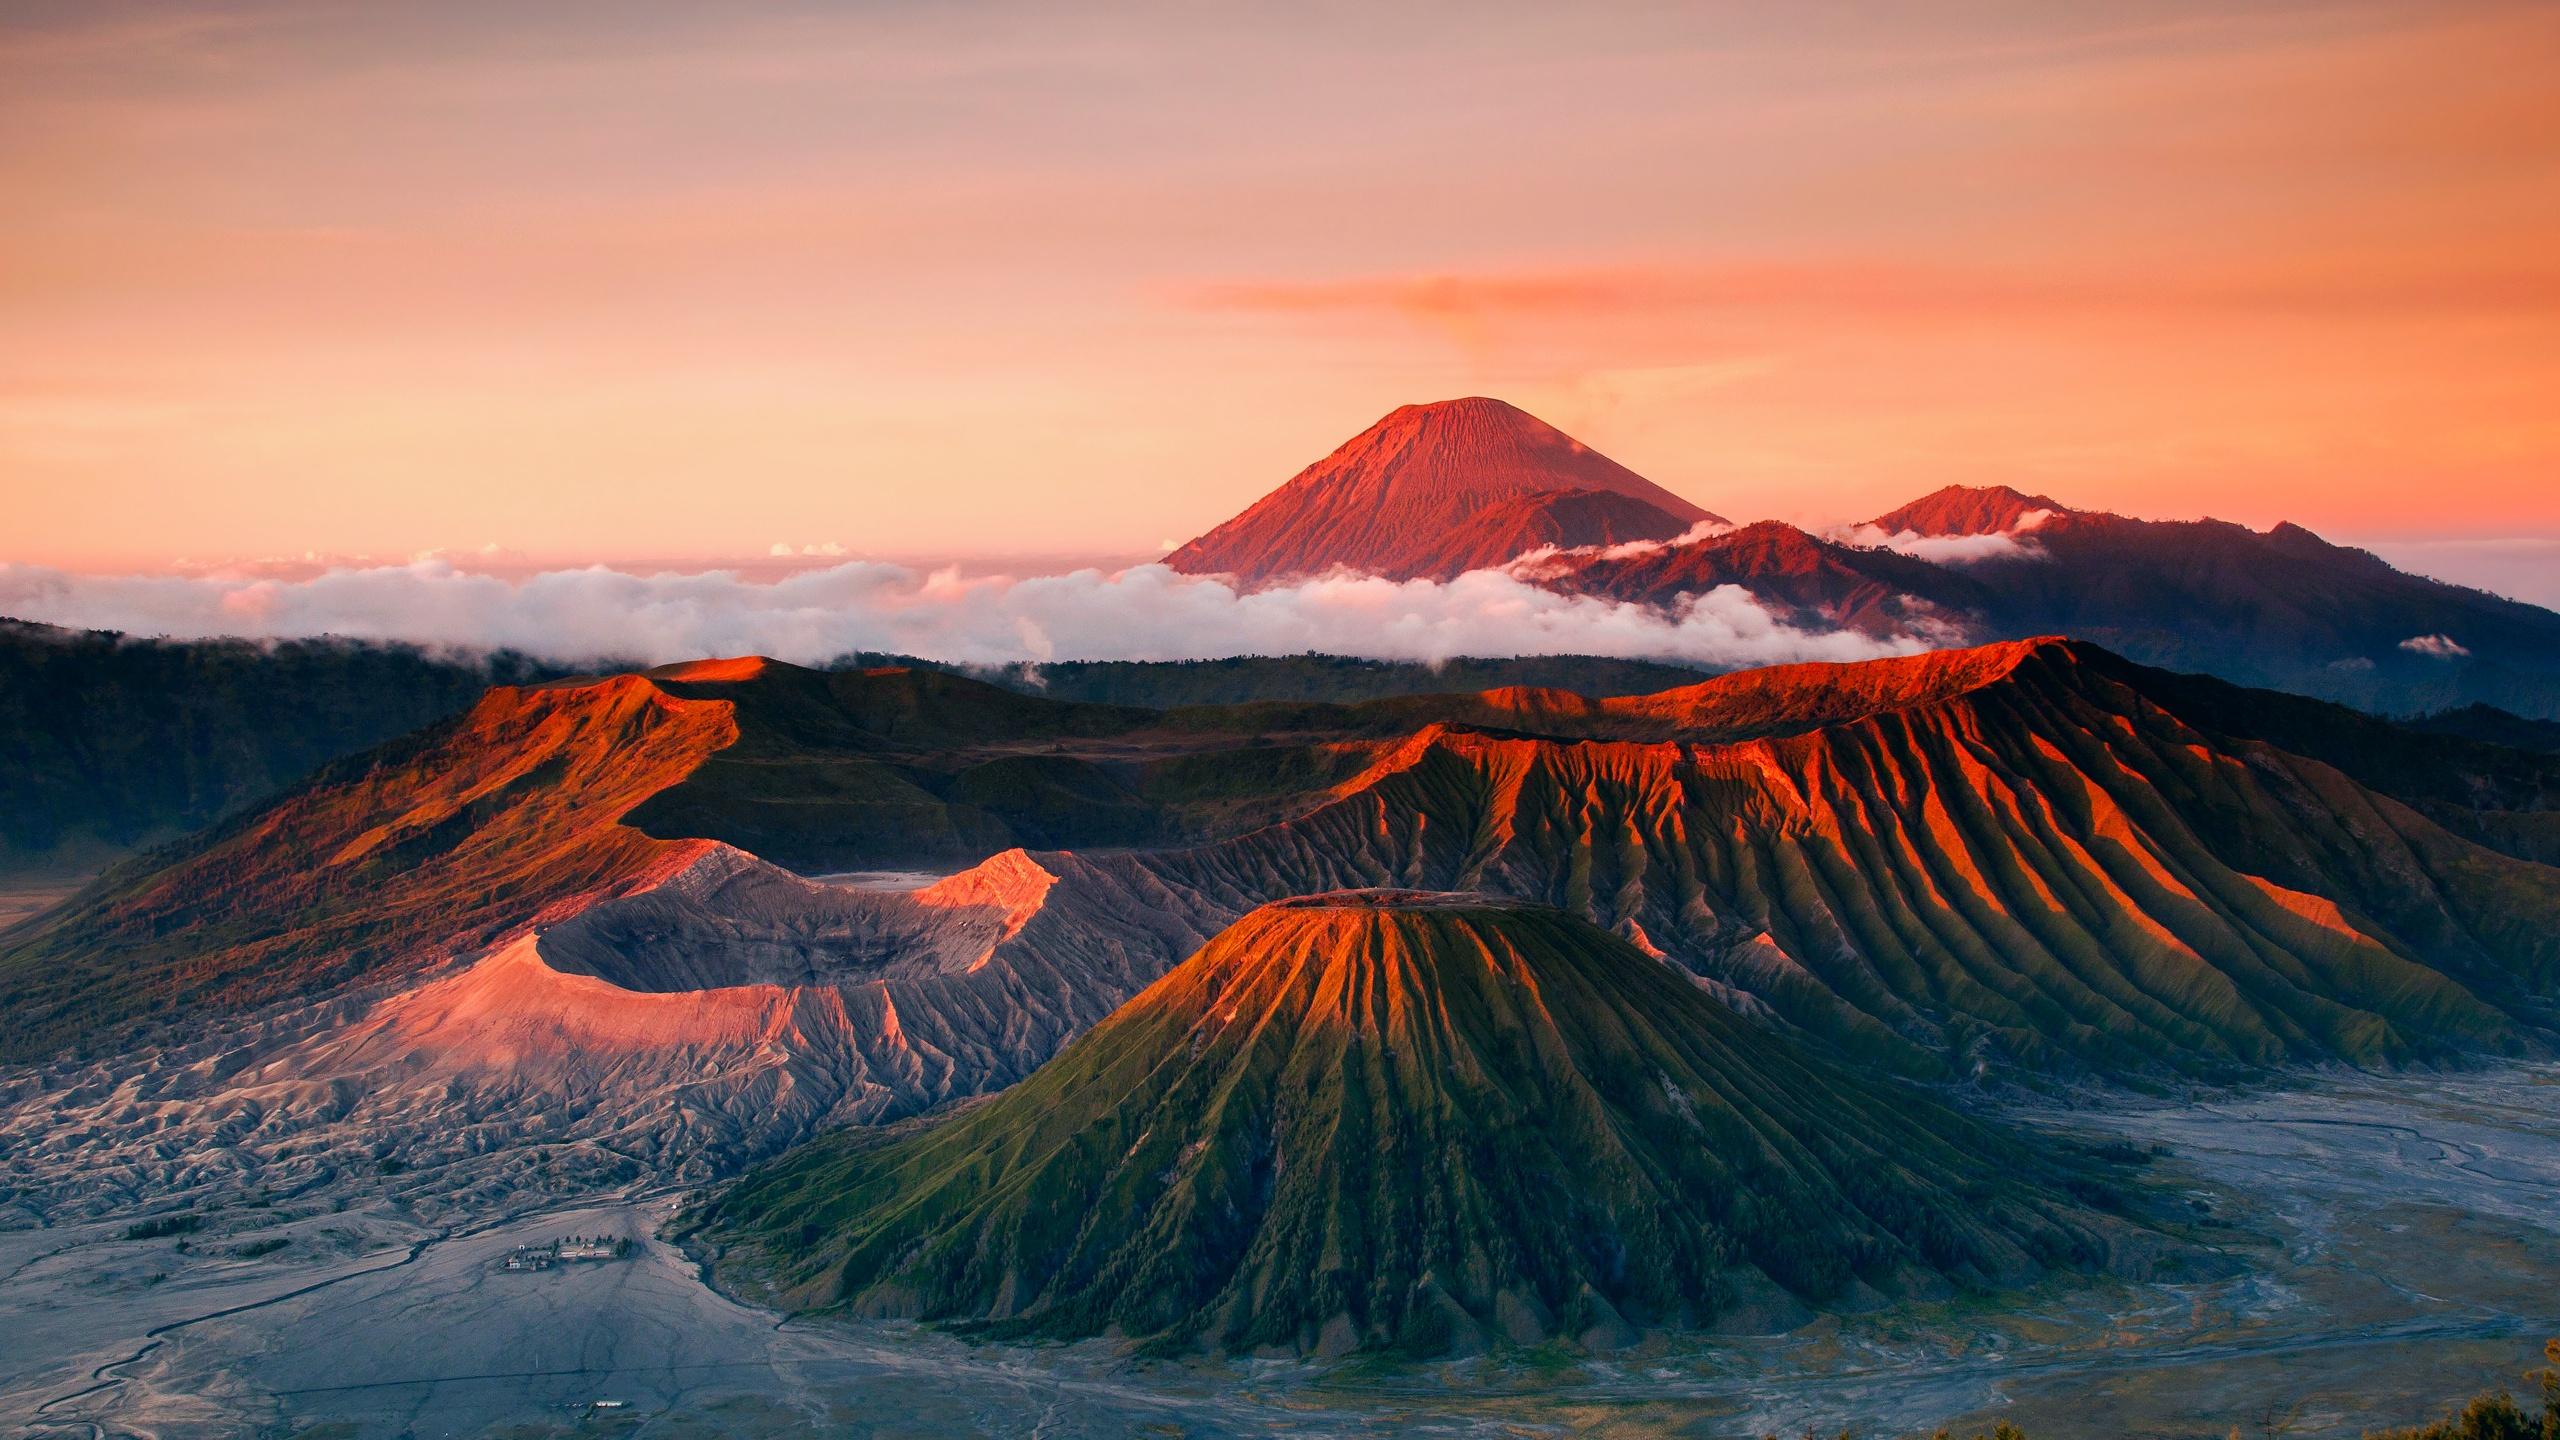 Indonesien Java Tenger Vulkan Berge Landschaft Nebel Hintergrundbilder  2560x1440 QHD